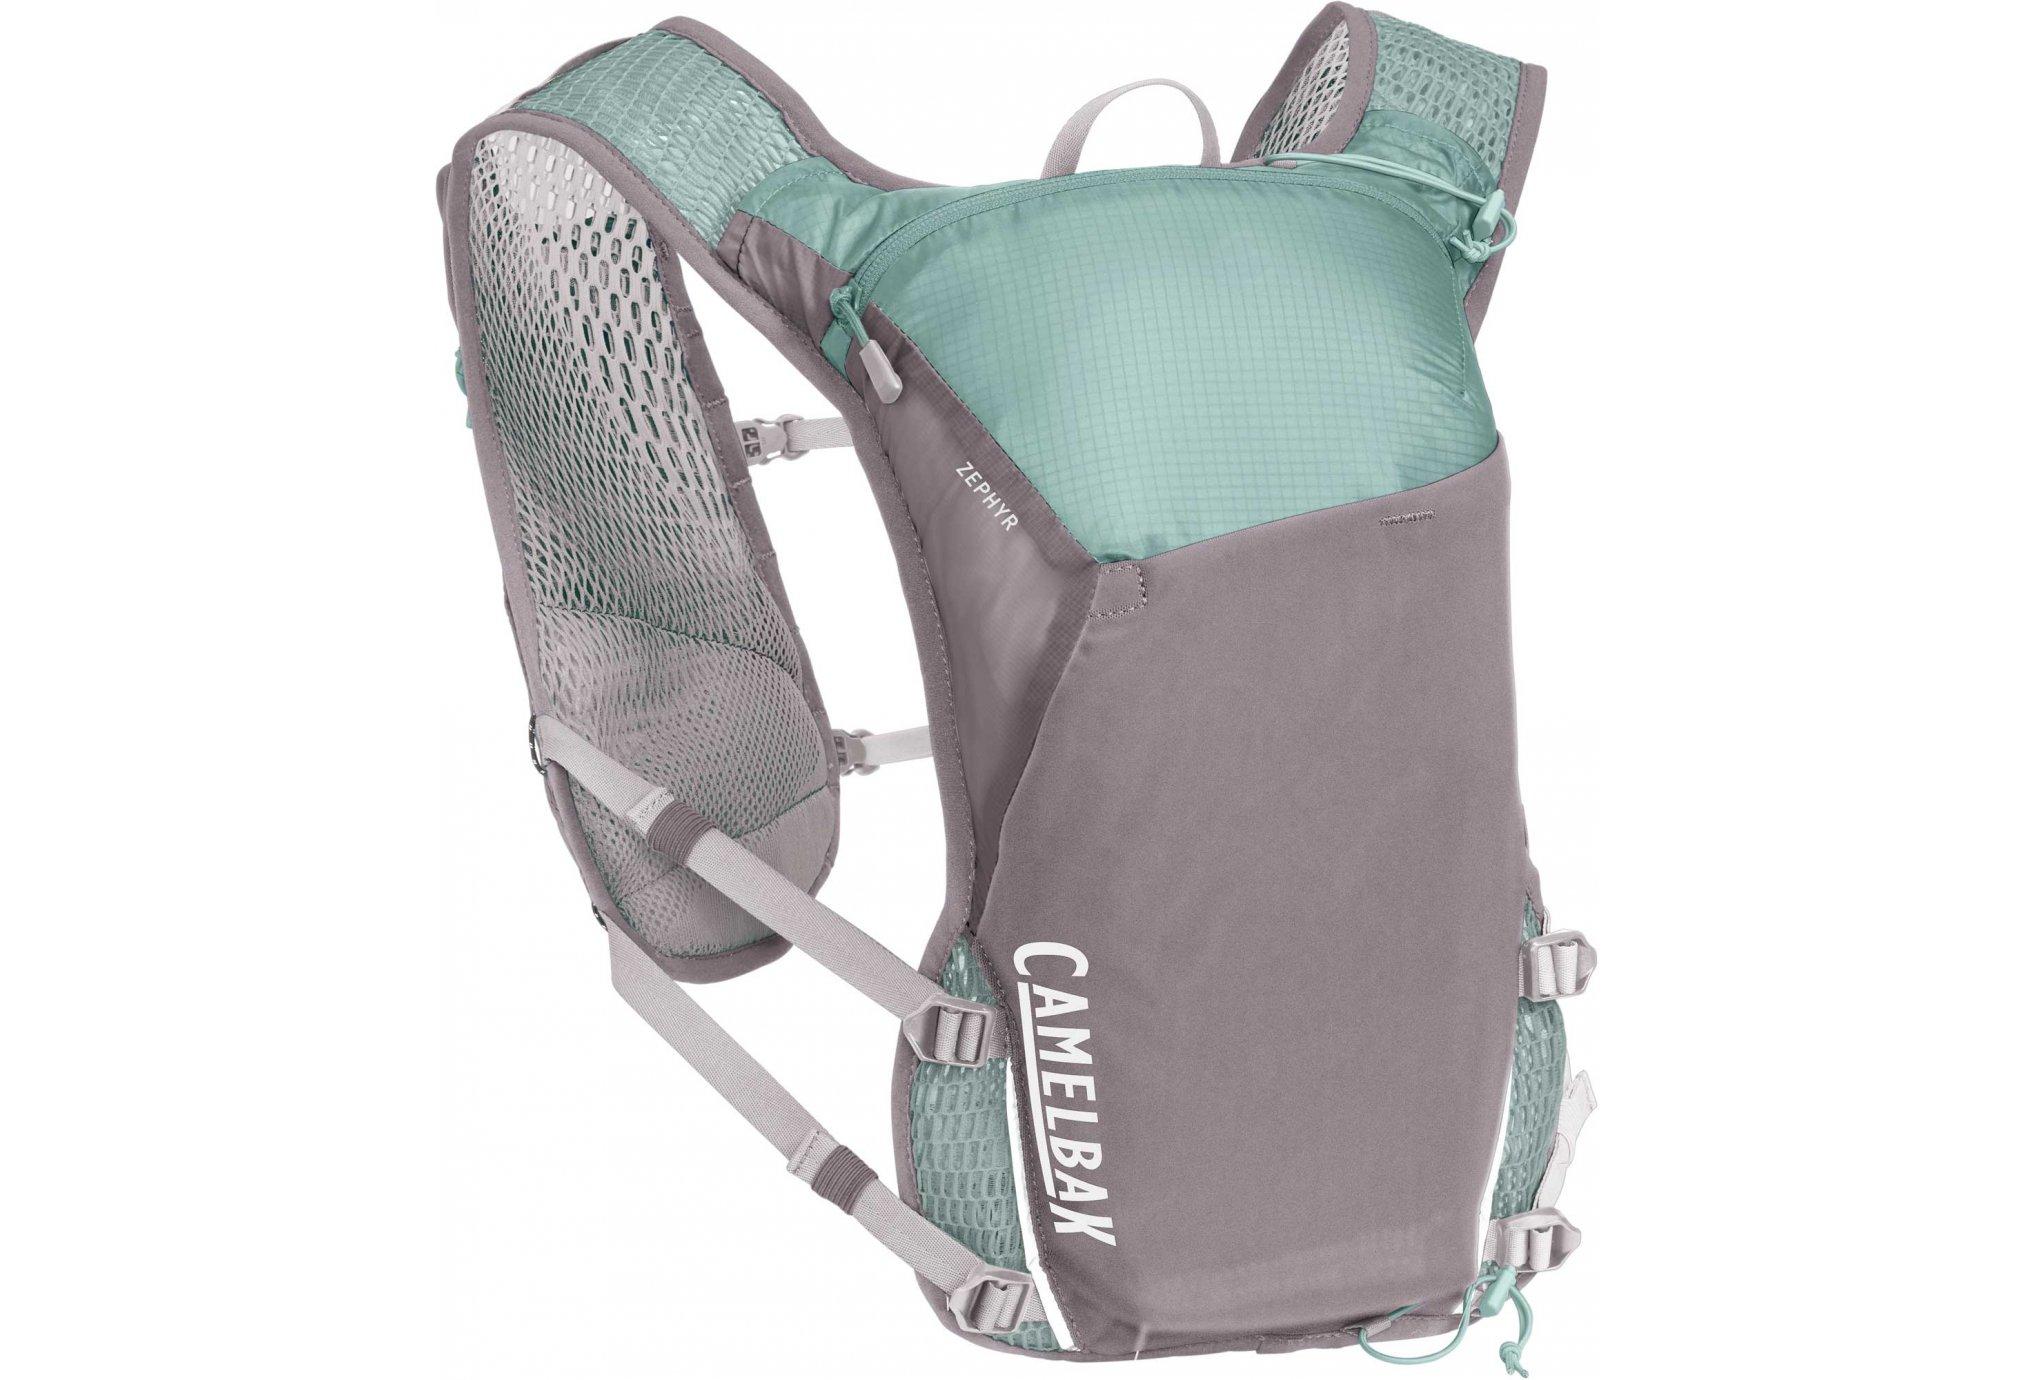 Camelbak Zephyr Vest W Sac hydratation / Gourde